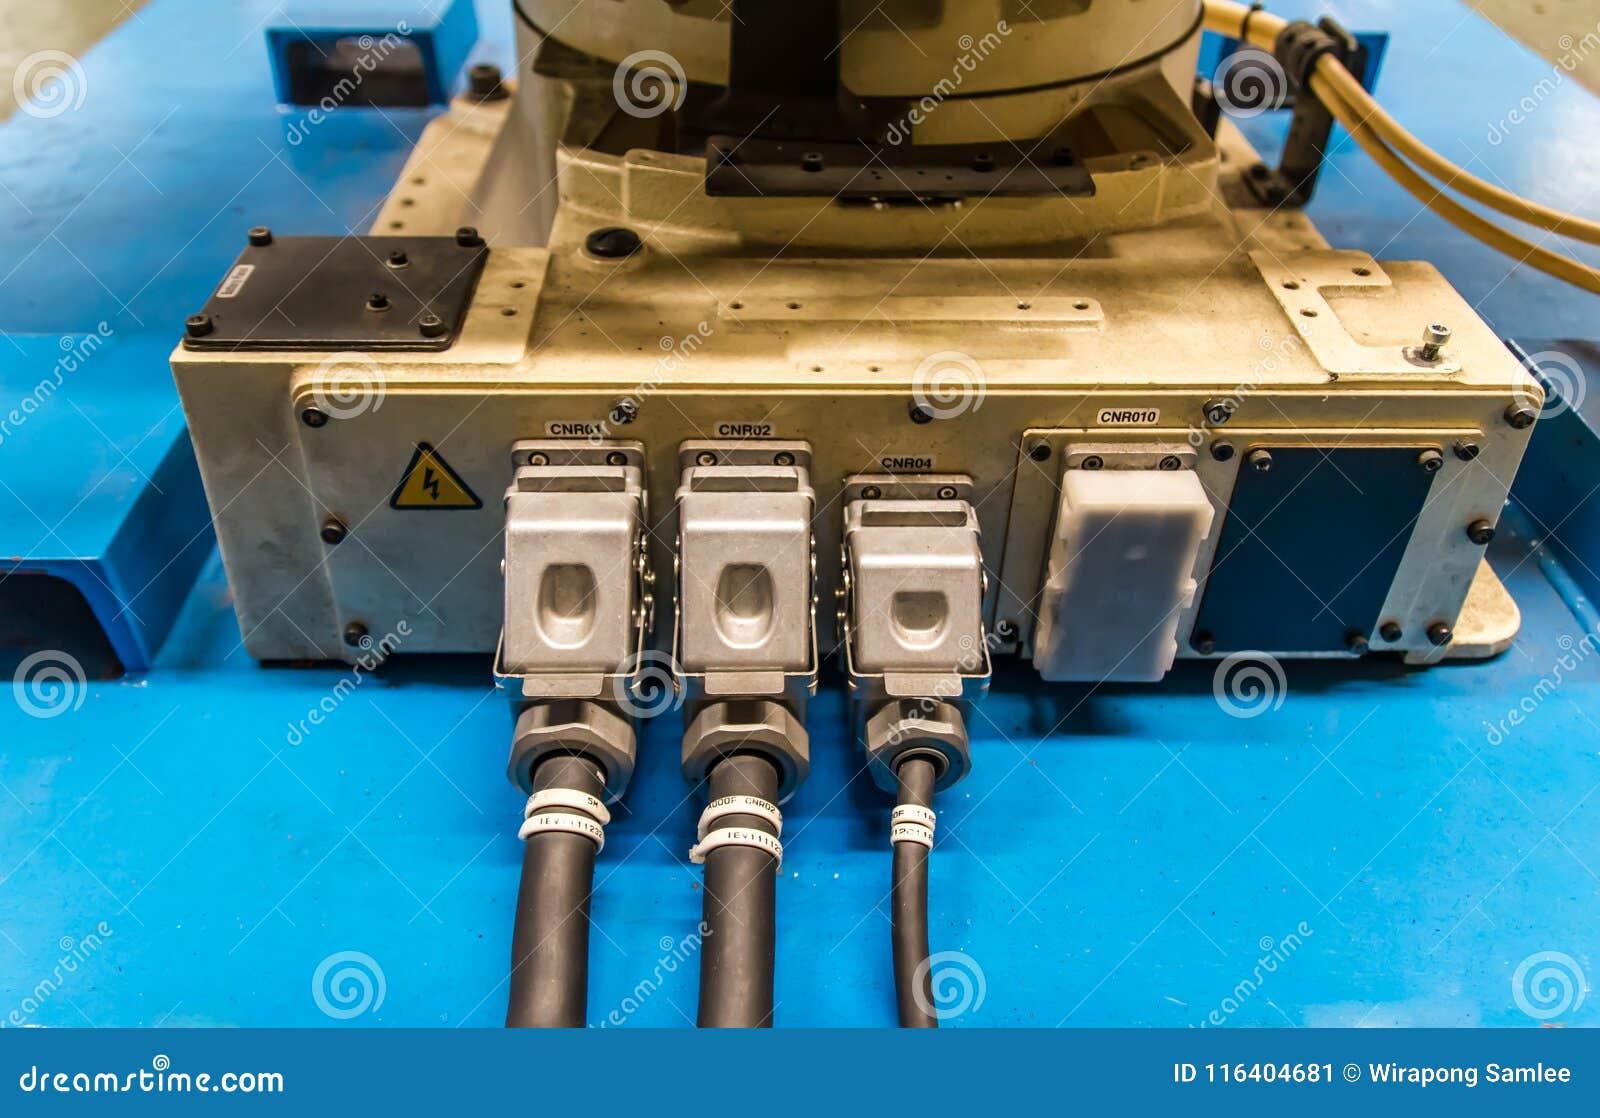 Robot weld connector wiring in machine industrial